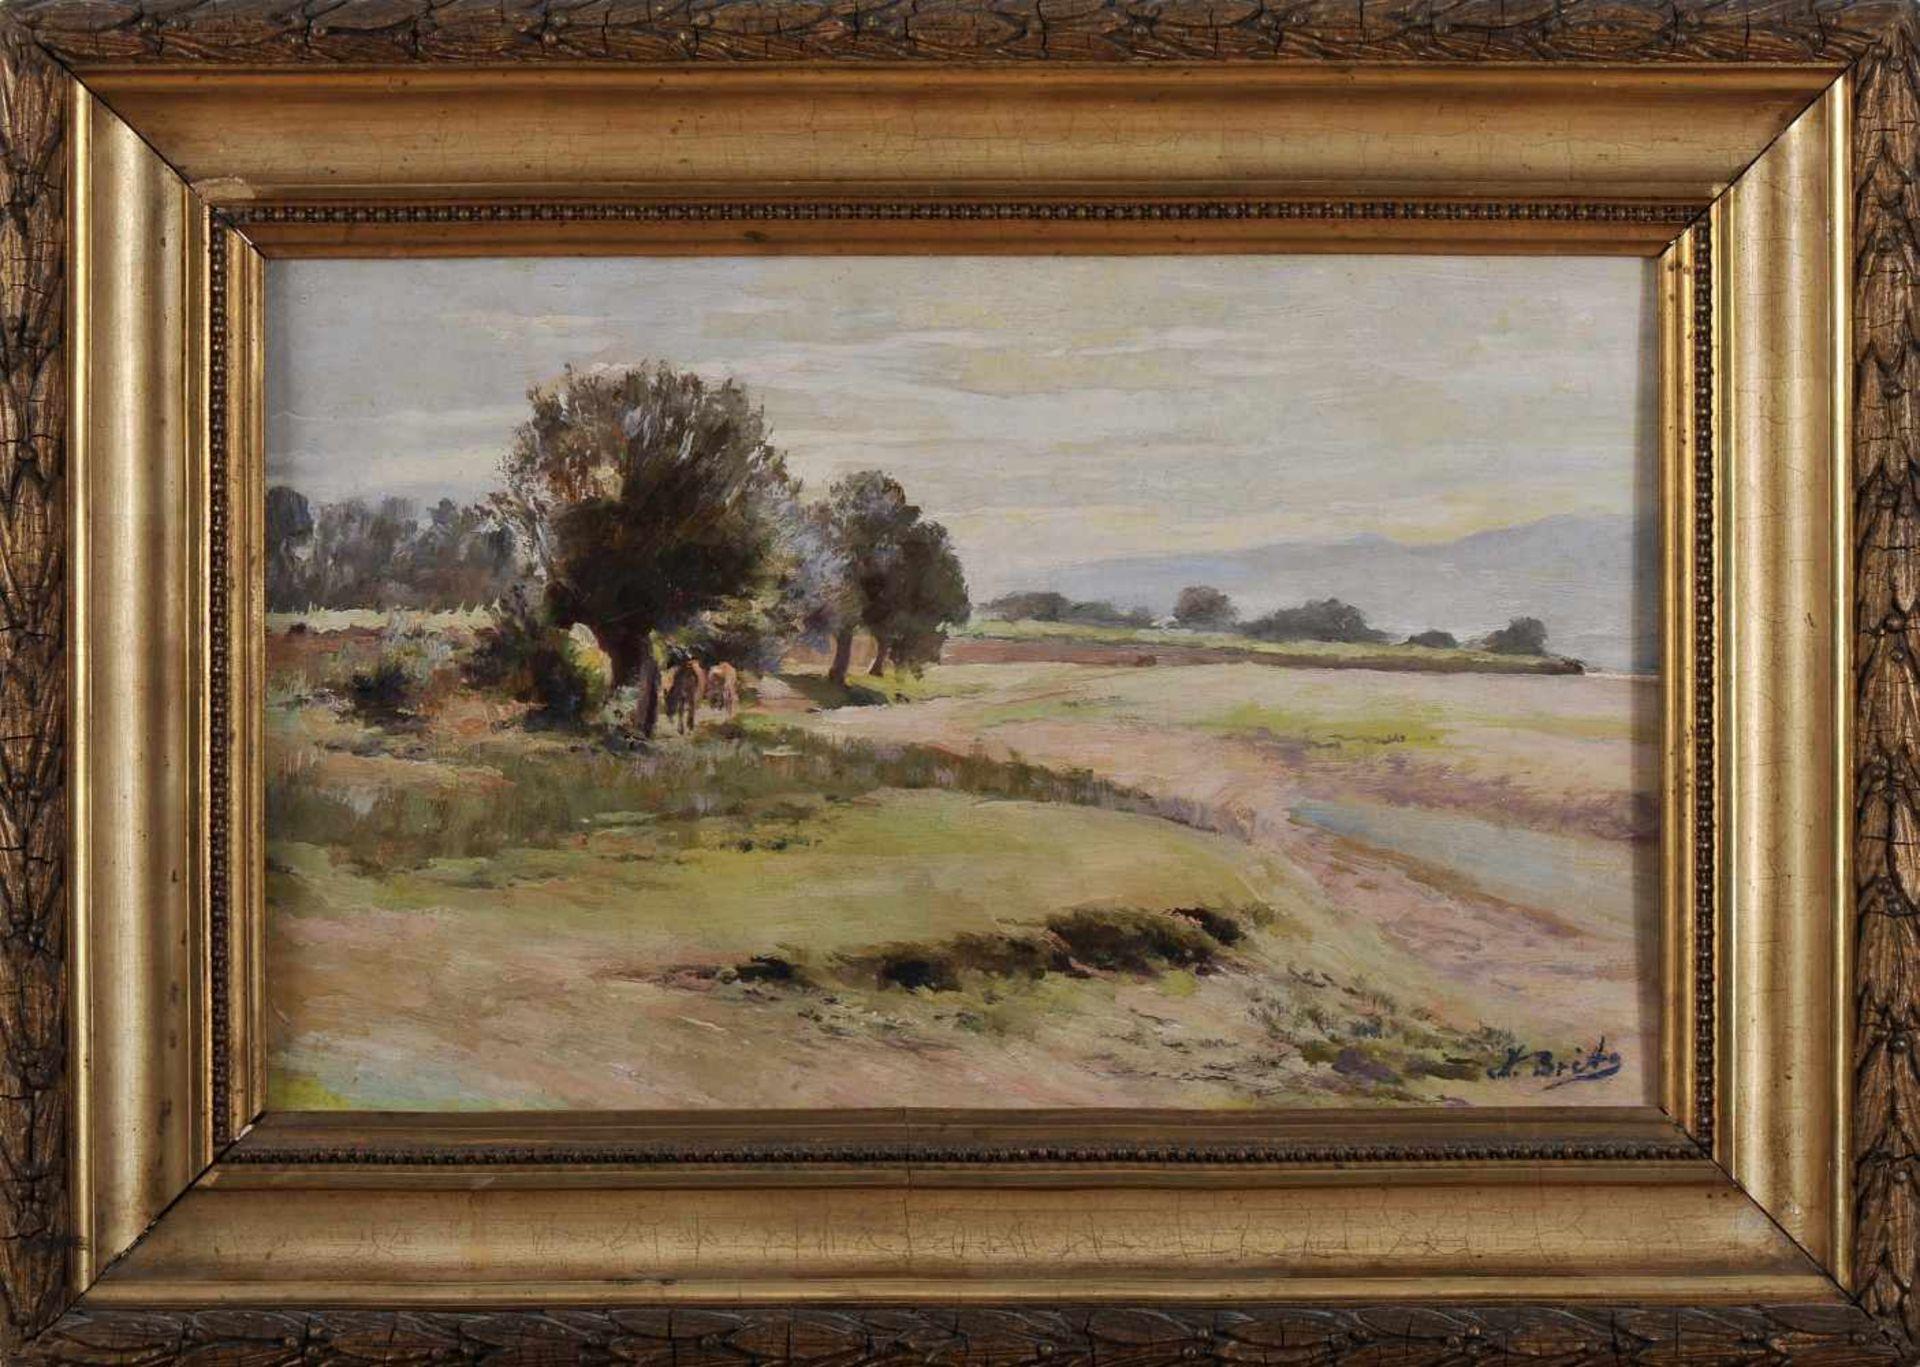 Los 94 - Landscape with animalsJOSÉ DE BRITO - 1855-1946, Landscape with animals, oil on wood, small...